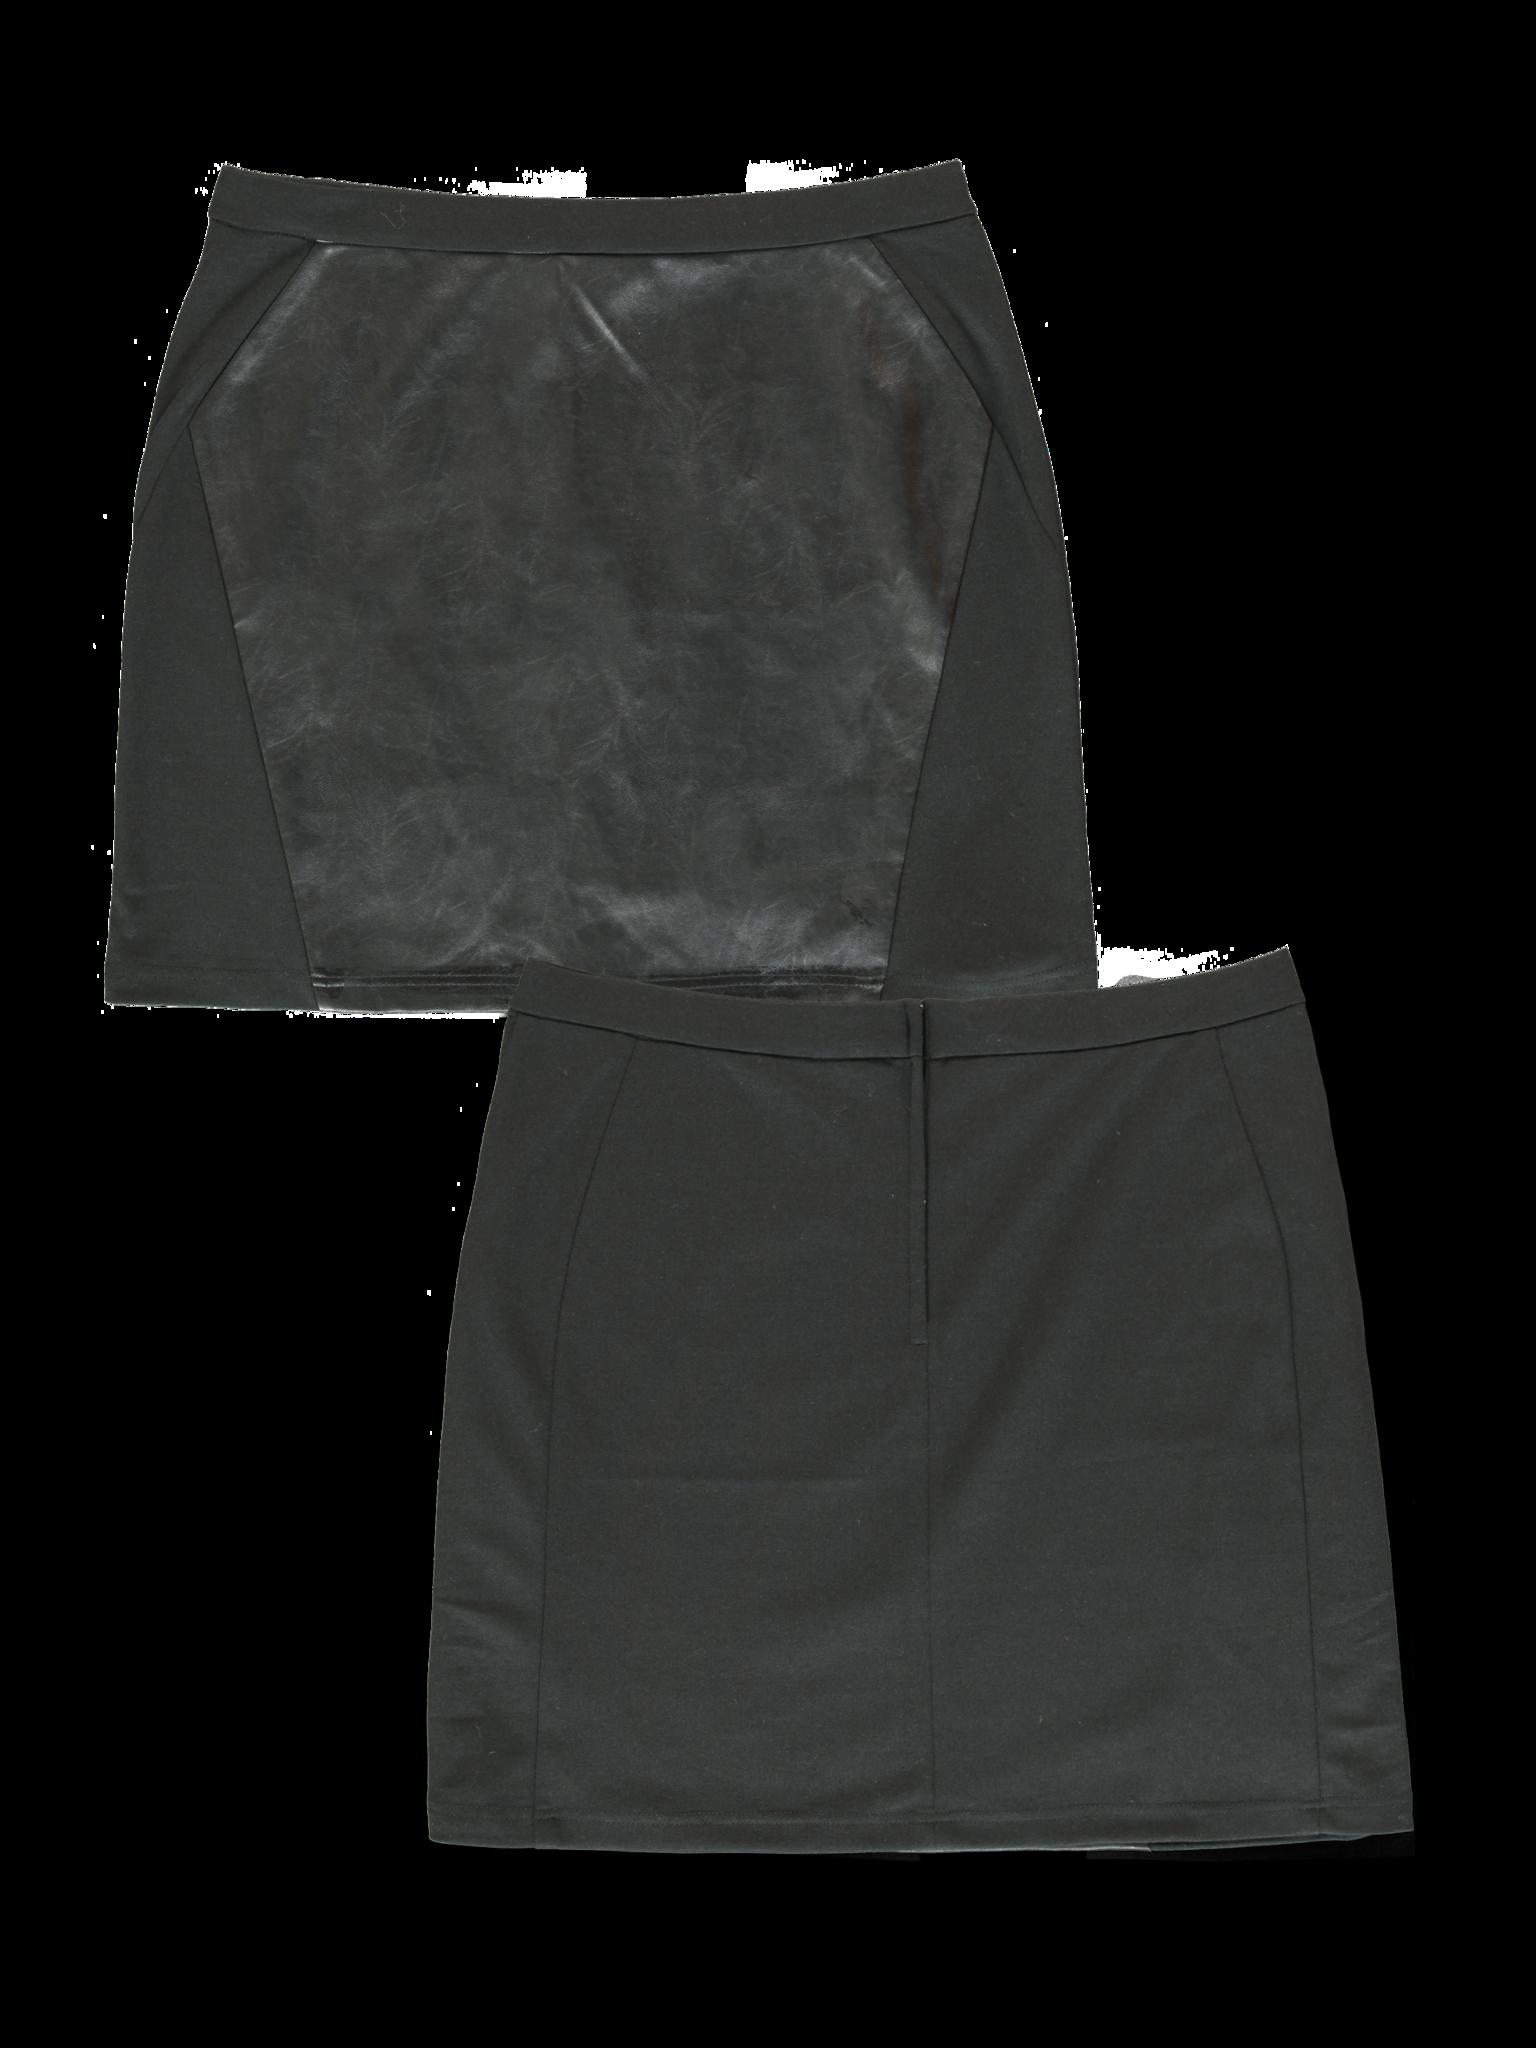 All Brands | Winterproducts Ladies+ | Skirt | 24 pcs/box